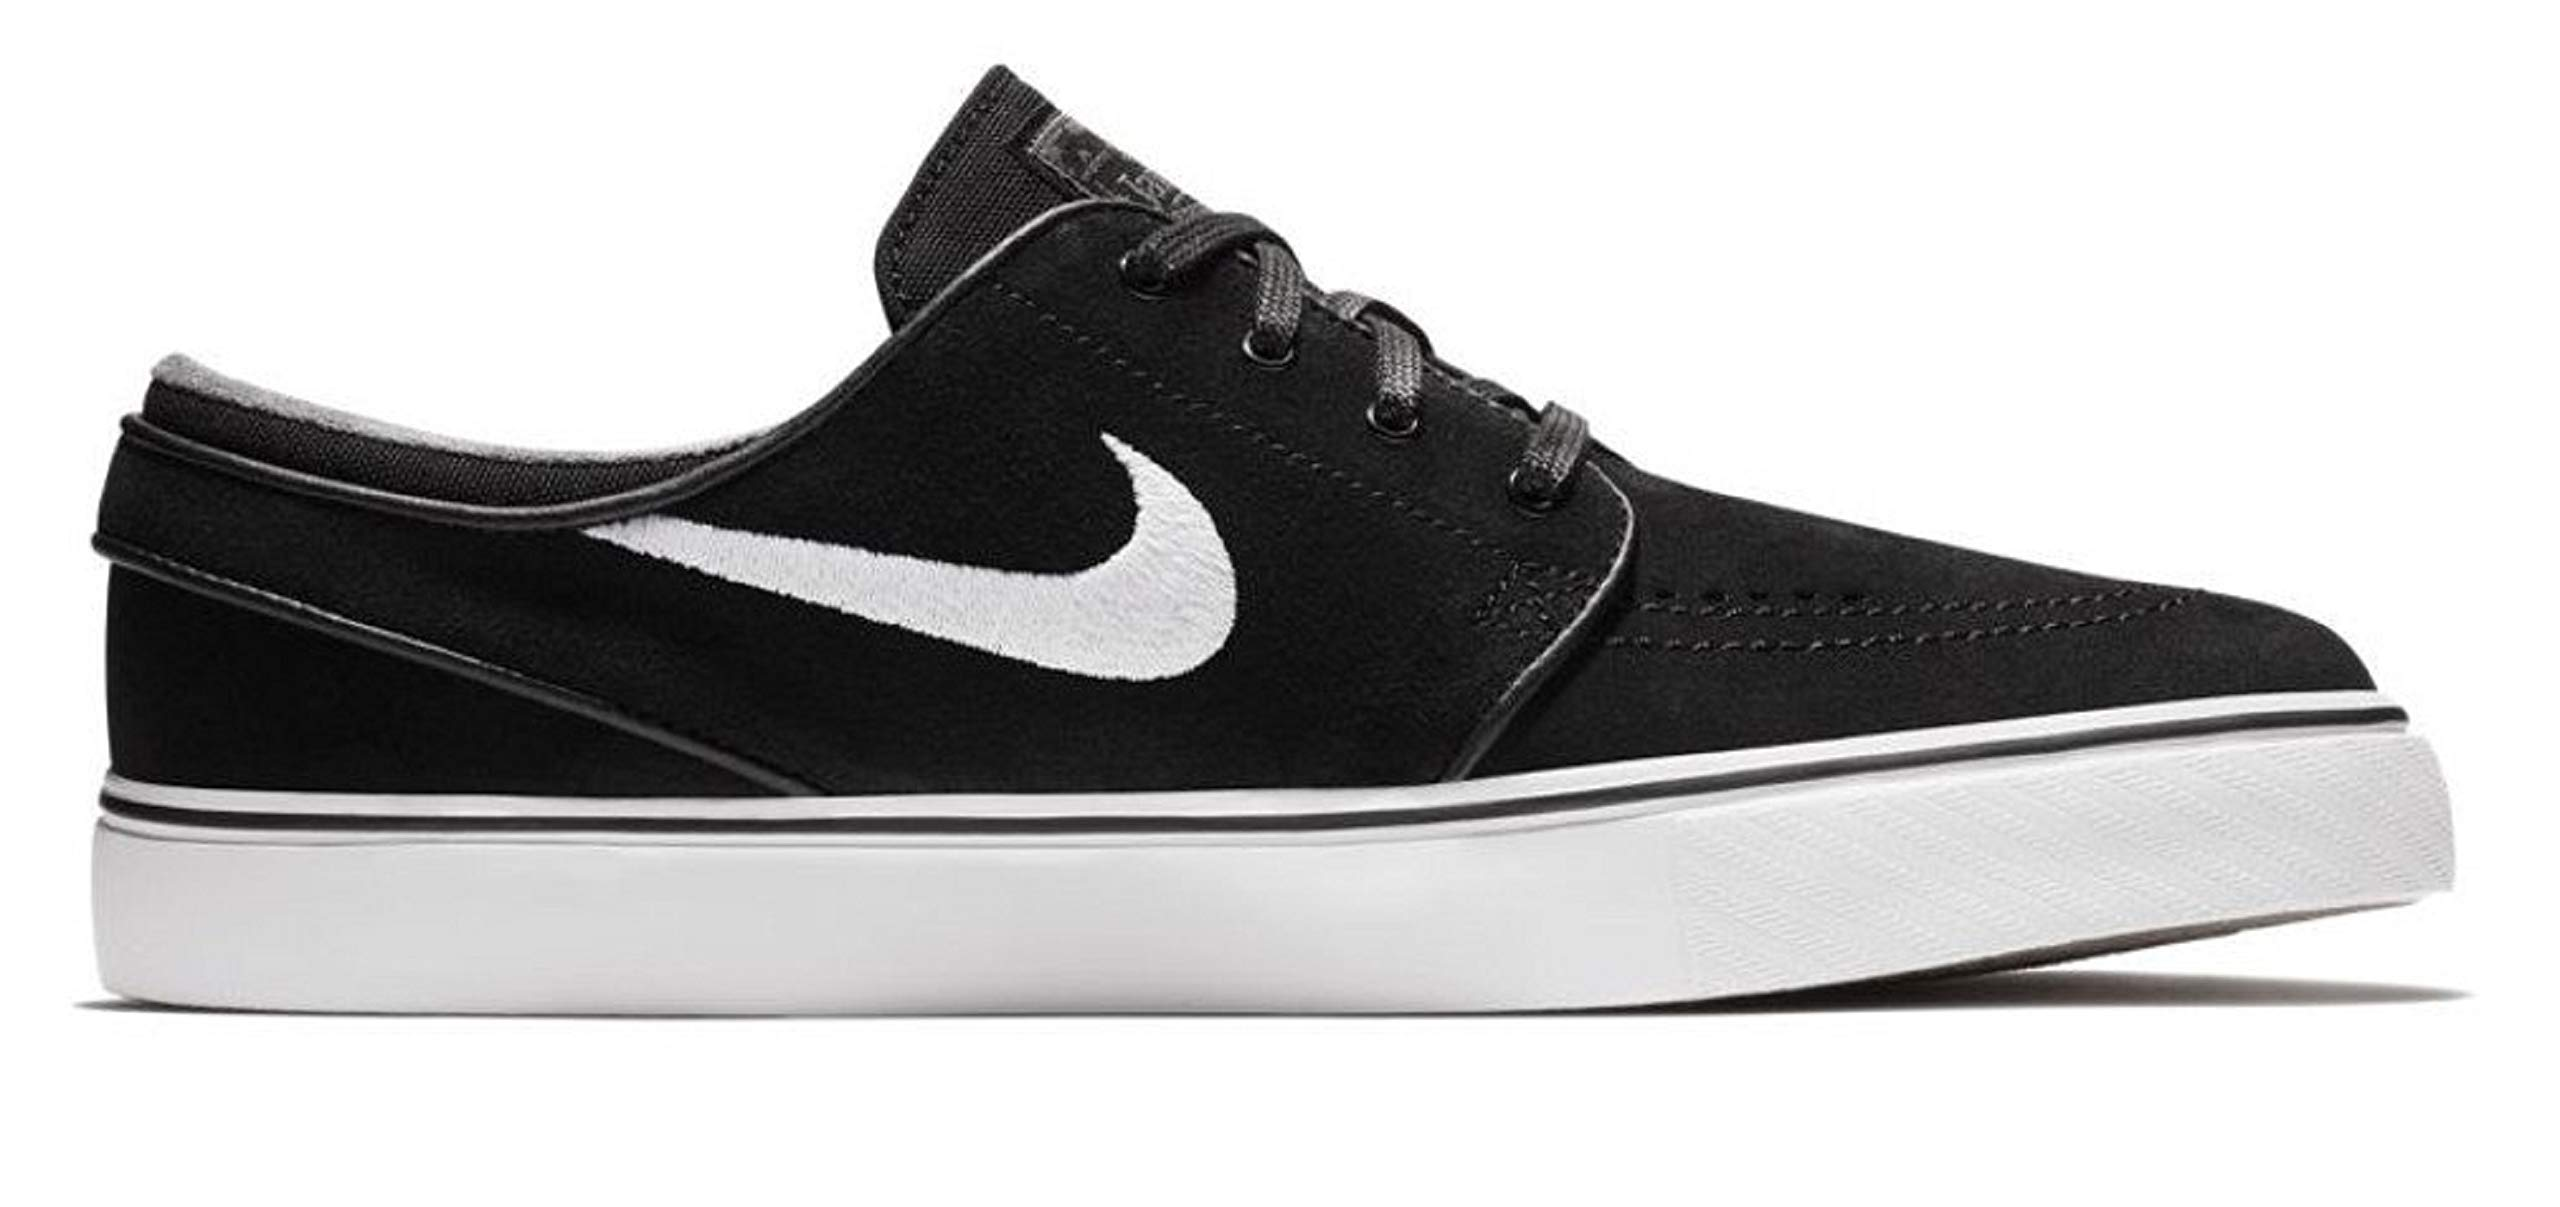 new style dc078 3eb2f Galleon - Nike Zoom Stefan Janoski Mens Fashion-Sneakers 333824-067 10.5 -  Black White-Thunder Grey-Gum Light Brown